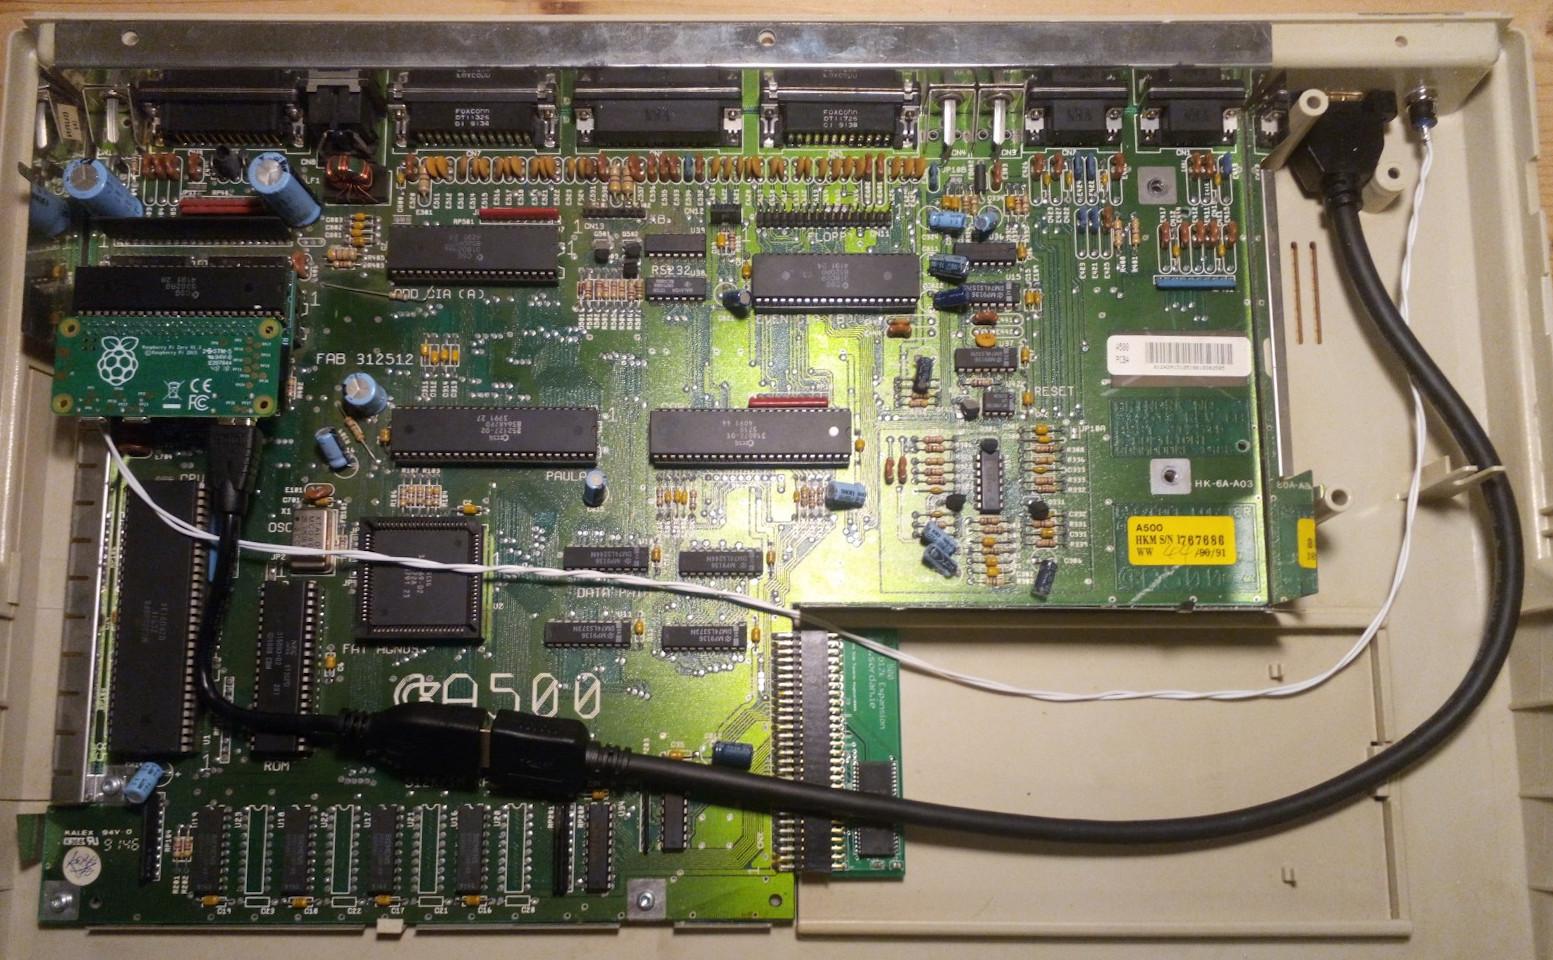 Amiga 500 HDMI out using Raspberry Pi and RGBtoHDMI